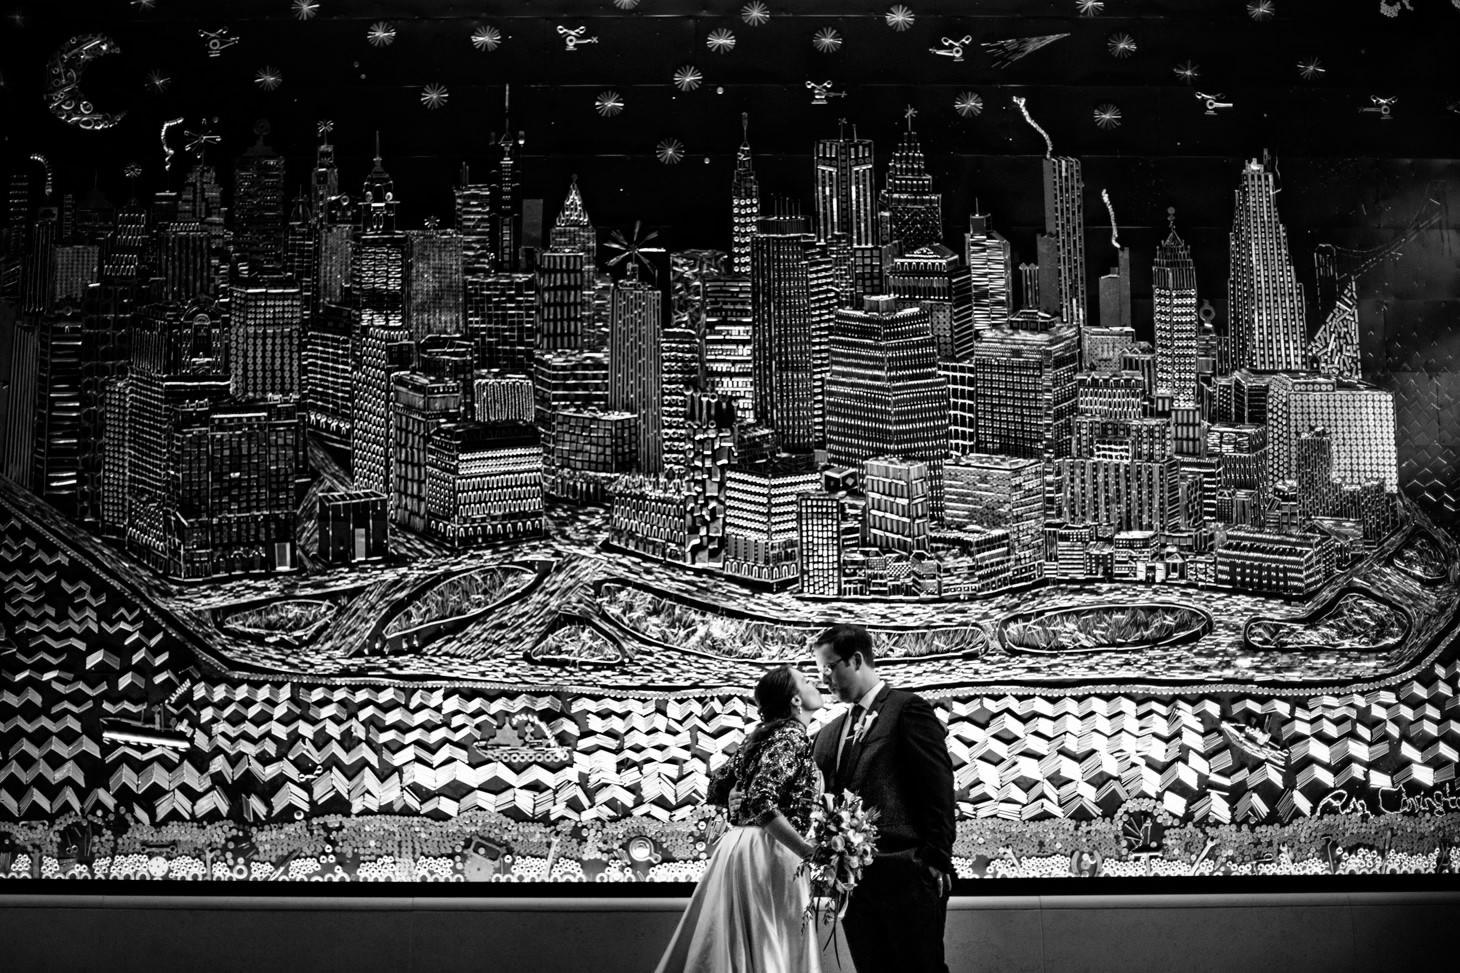 044-nyc-wedding-photographer-hoboken-waterfront-wedding-photos-smitten-chickens.jpg